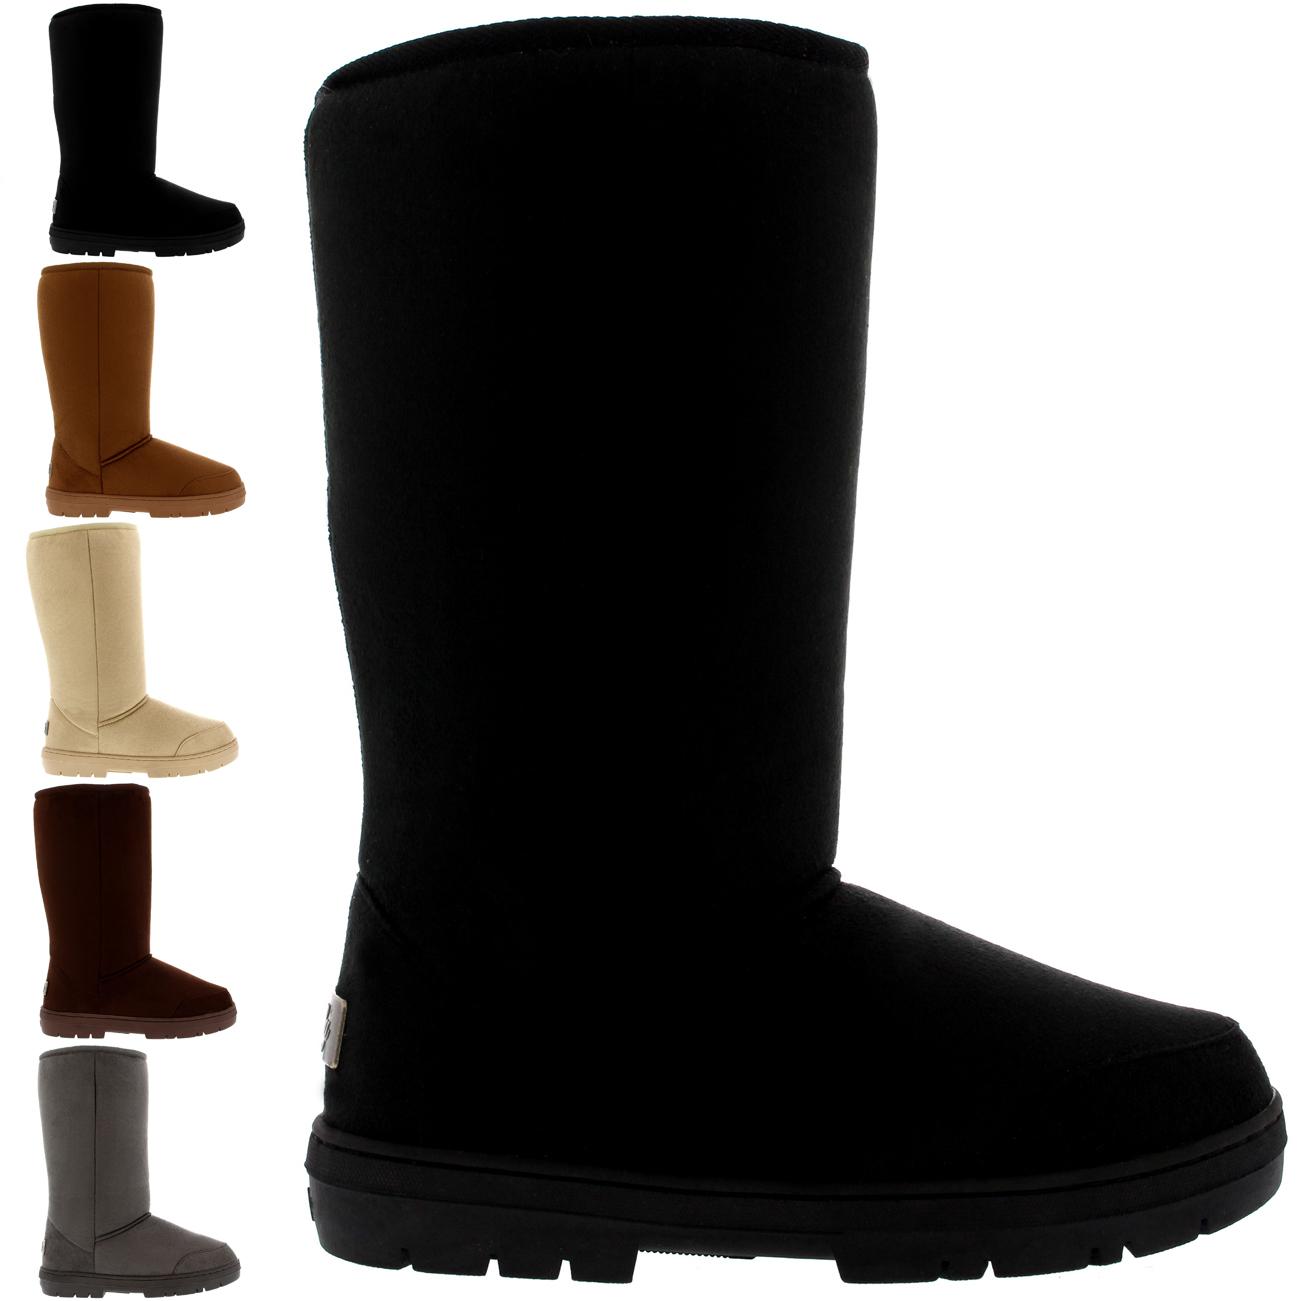 Original Tall Classic Fur Boots